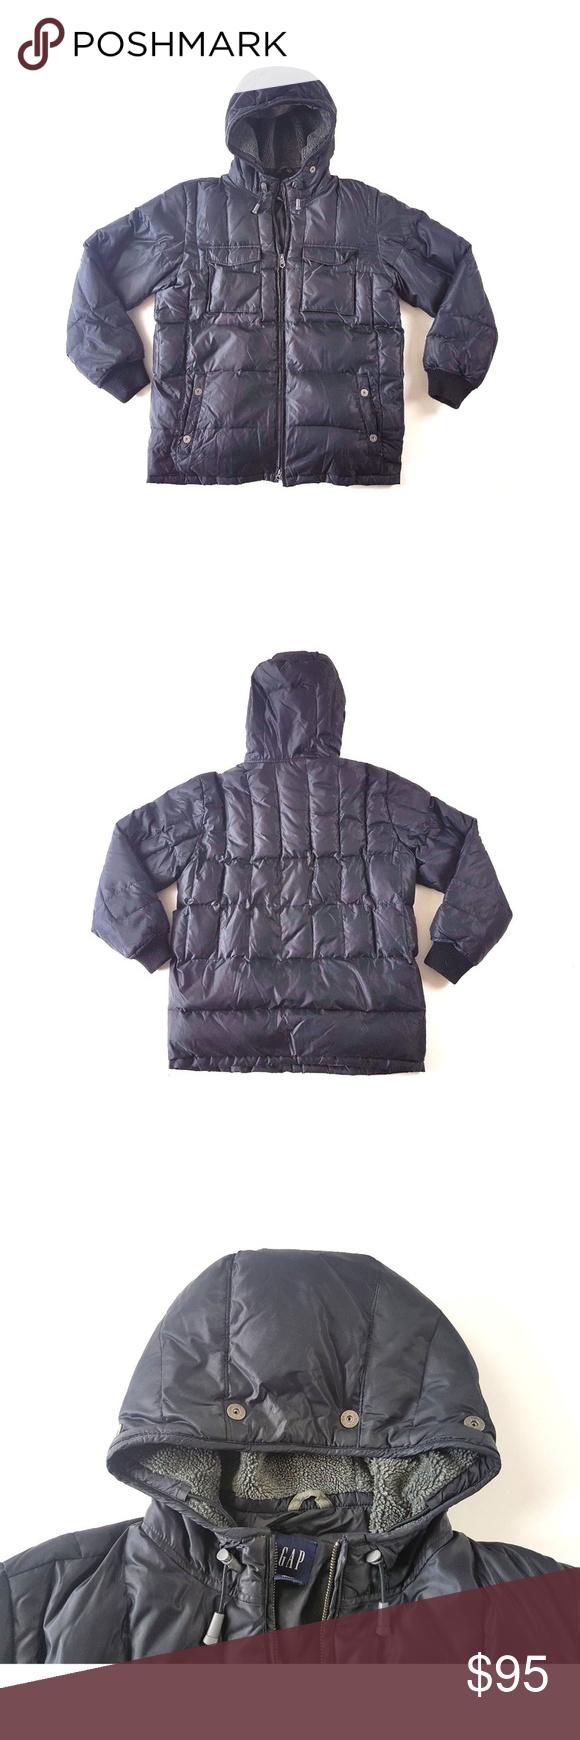 Gap Down Puffer Coat Jacket Sherpa Men S Large Down Puffer Coat Puffer Coat Jackets [ 1740 x 580 Pixel ]